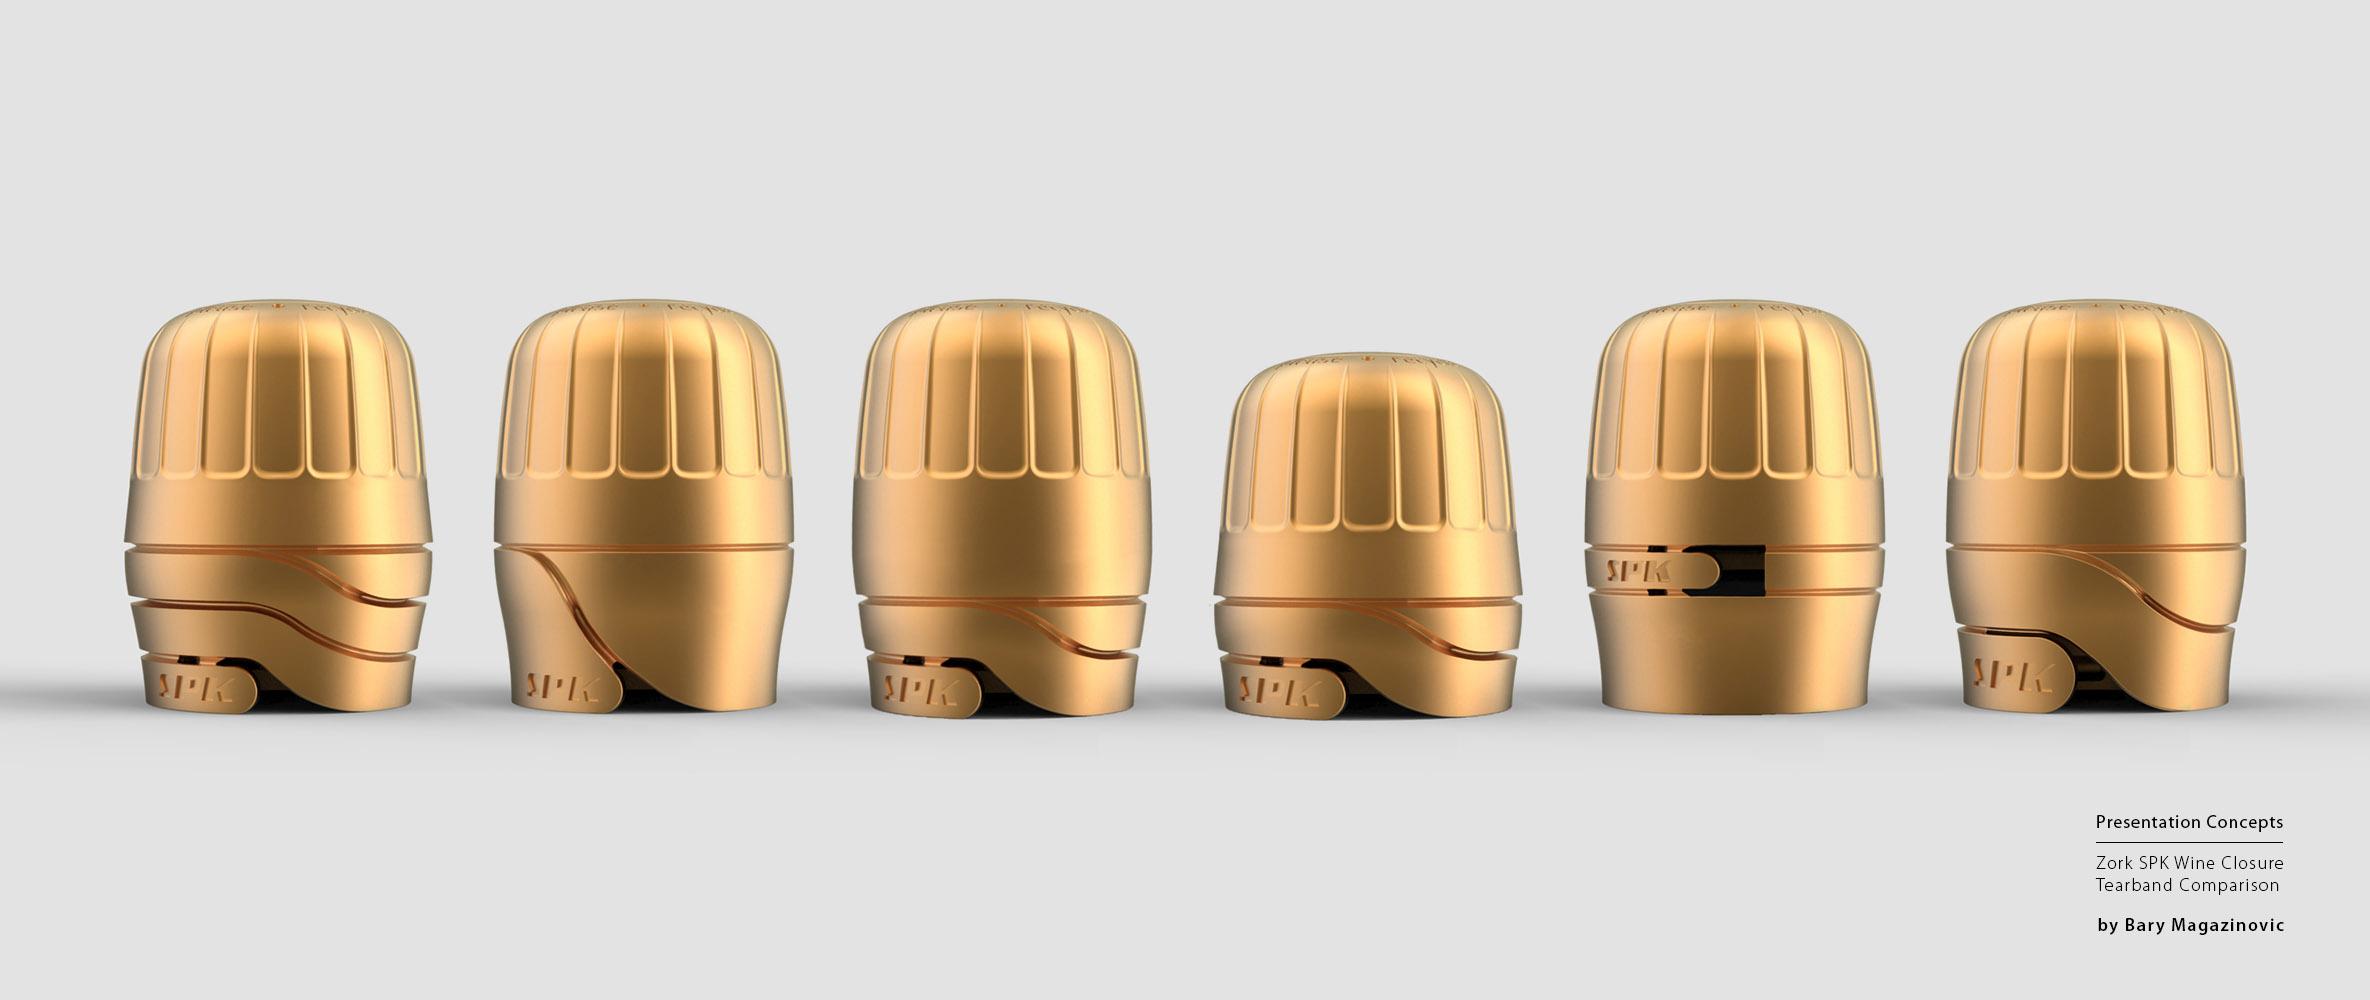 Australian Product Design Industrial Design graphic design SPK sparkling Champagne concept gold presentation illustrations by Barry Magazinovic